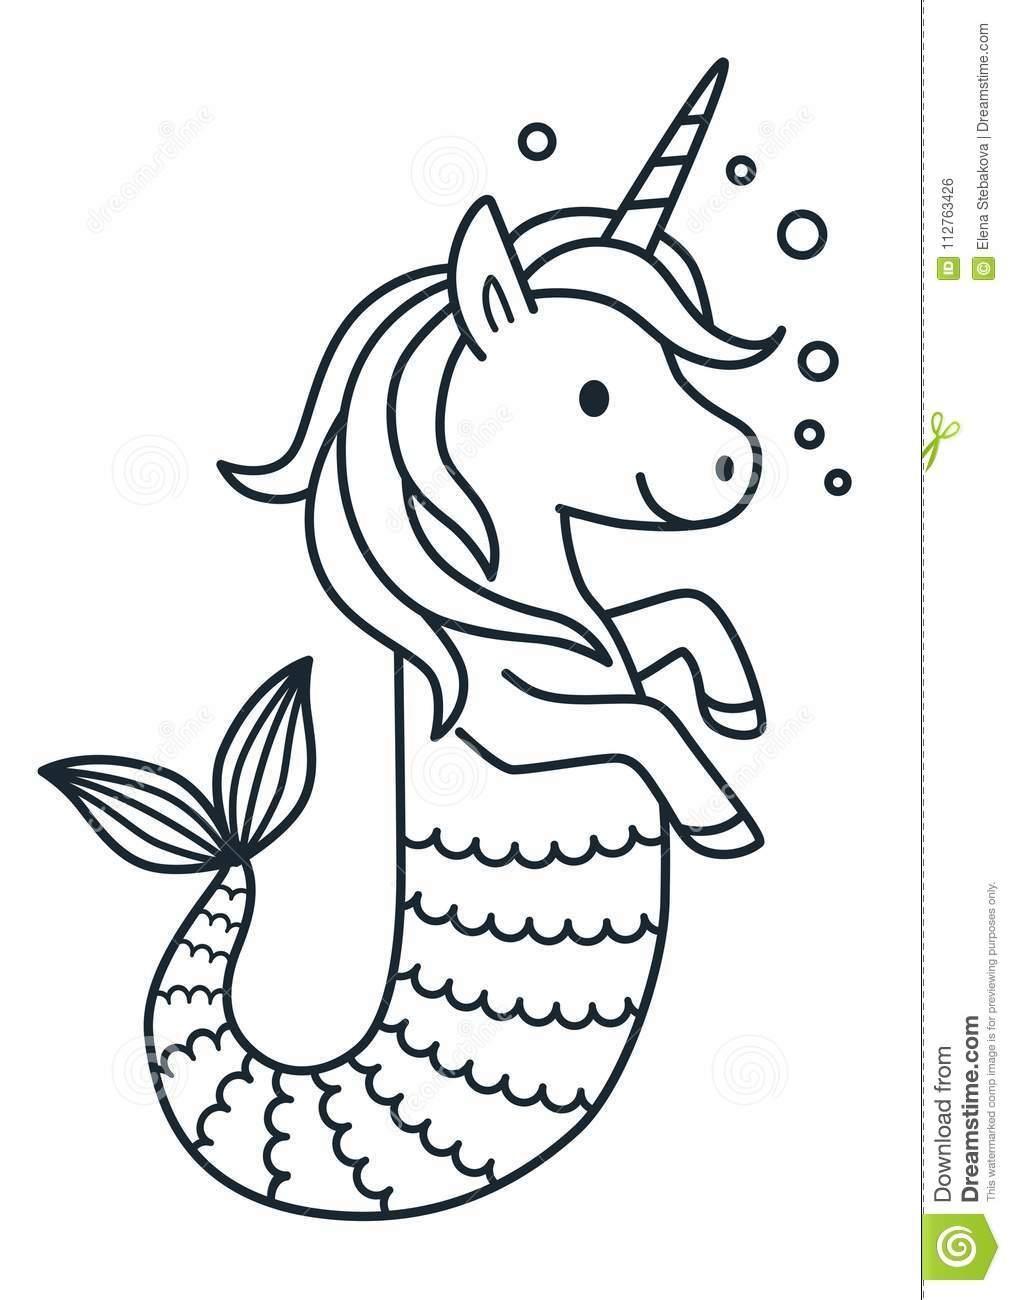 38 Coloring Page Mermaid Unicorn Mermaid Coloring Book Mermaid Coloring Pages Ariel Coloring Pages